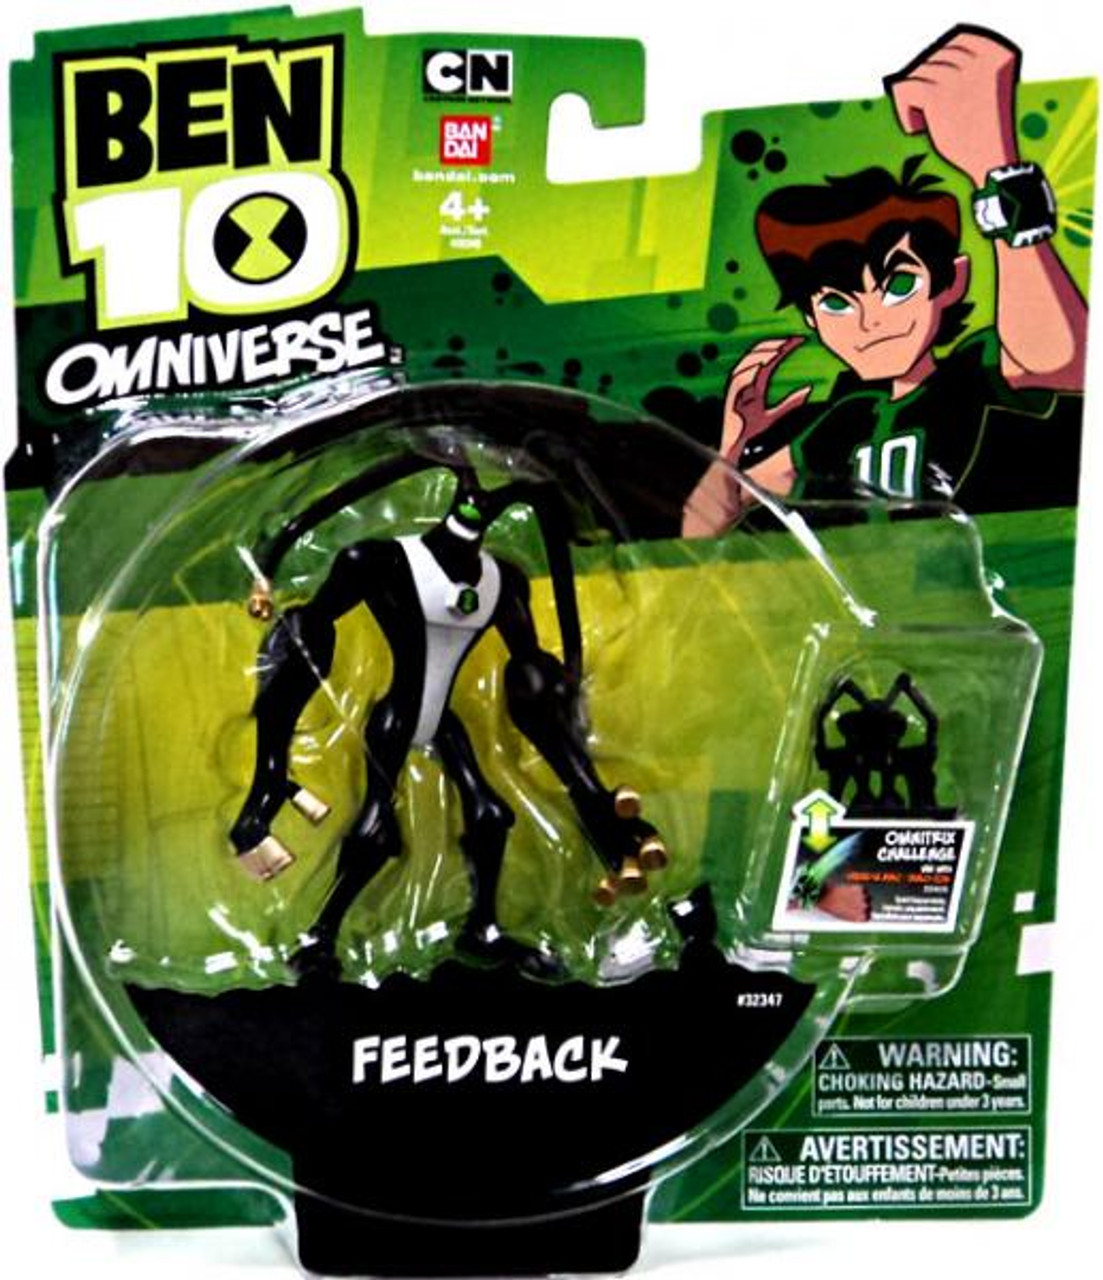 Ben 10 Omniverse 4-Inch Feedback Action Figure